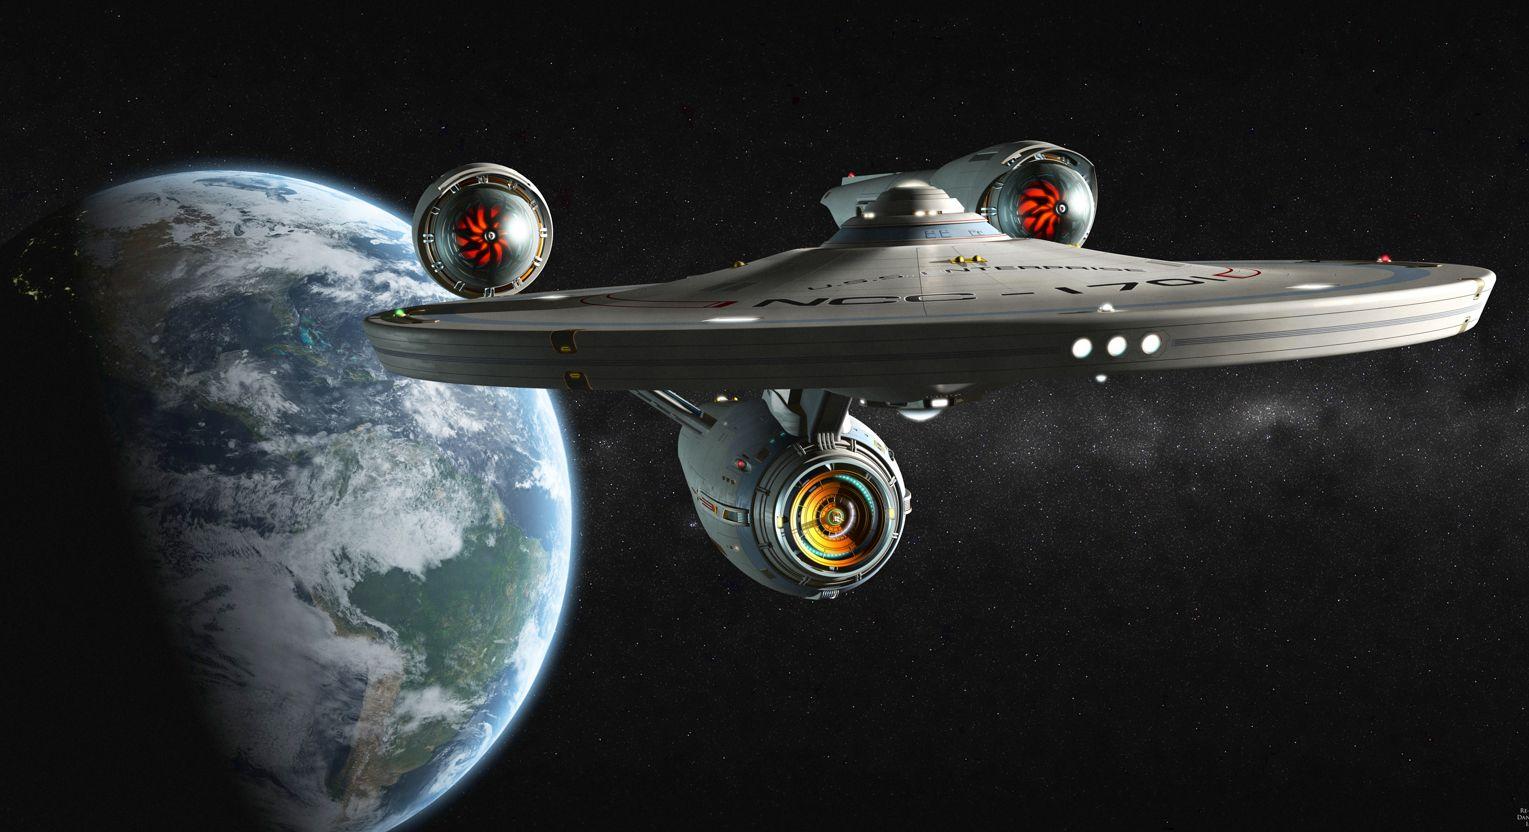 star-trek-tv-series-must-include-that-the-new-films-forgot-new-star-t-727324.jpg